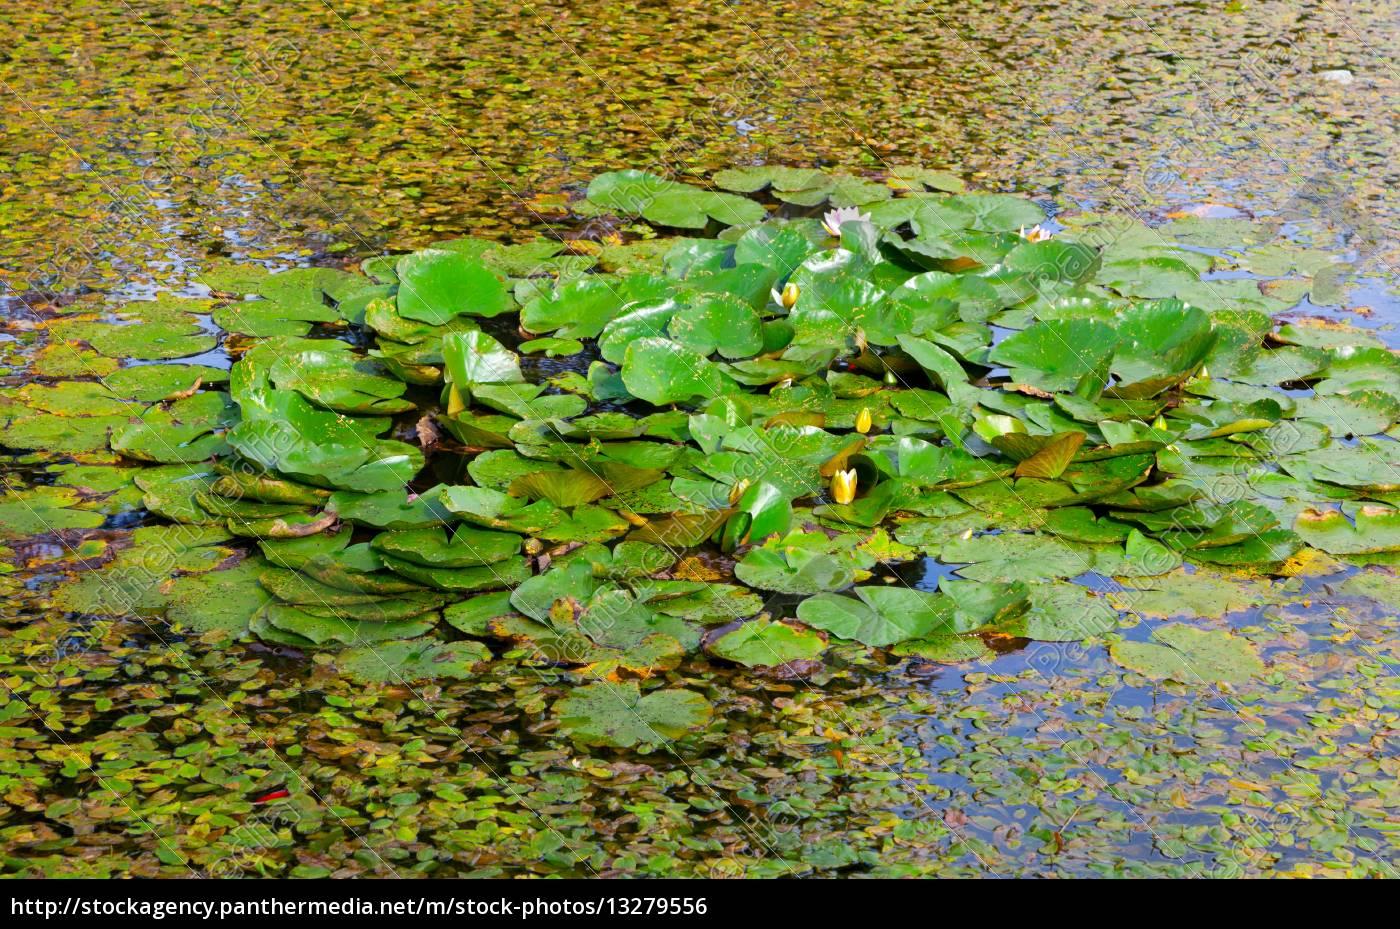 lake / pond with lotus lake / pond with lotus - Royalty free photo -  #13279556 - PantherMedia Stock Agency